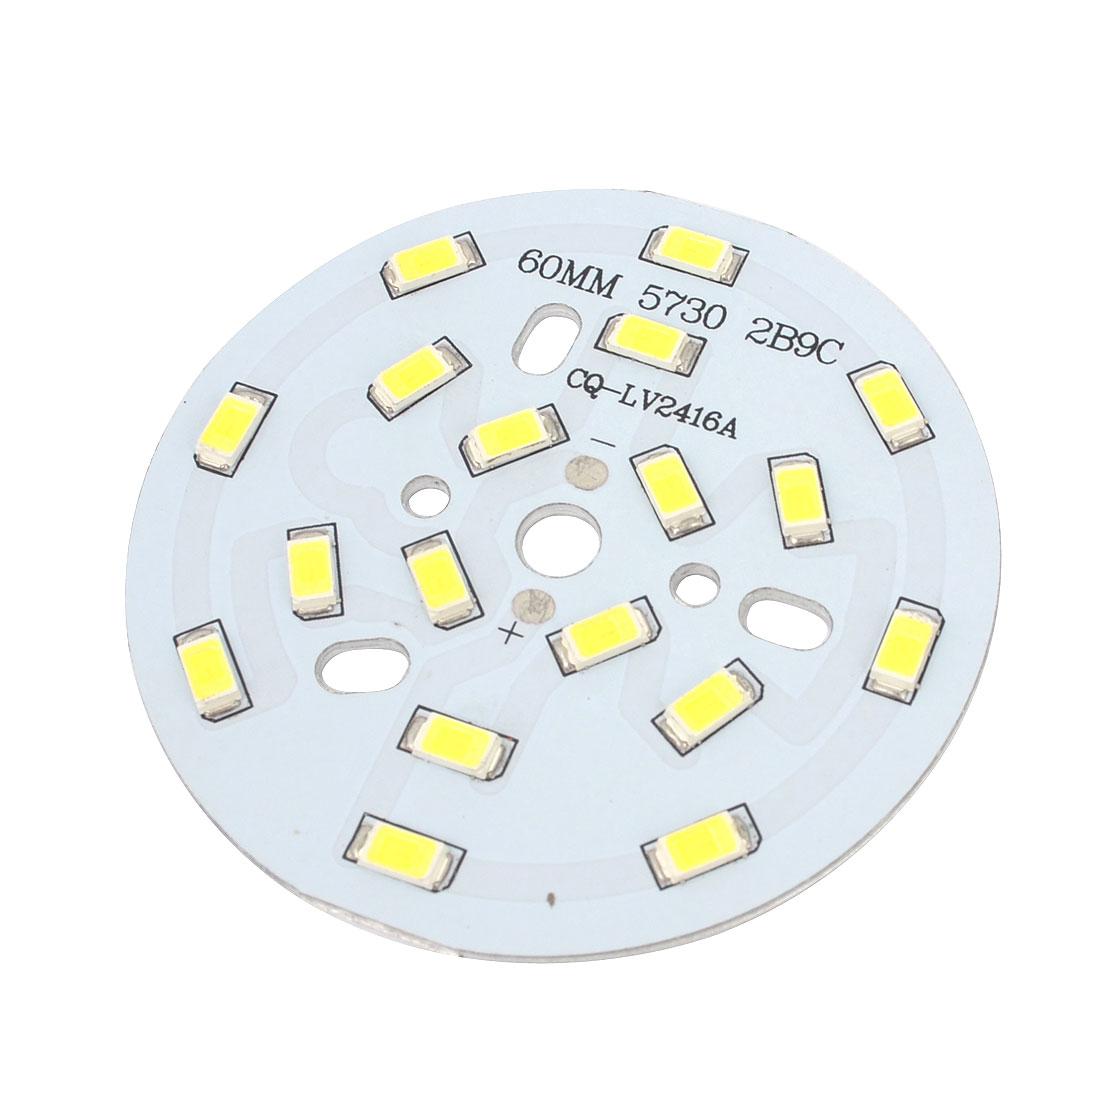 White 18 LED 9W 50-60Lm 5730 SMD + Aluminum Base Plate PCB 60mm DIY